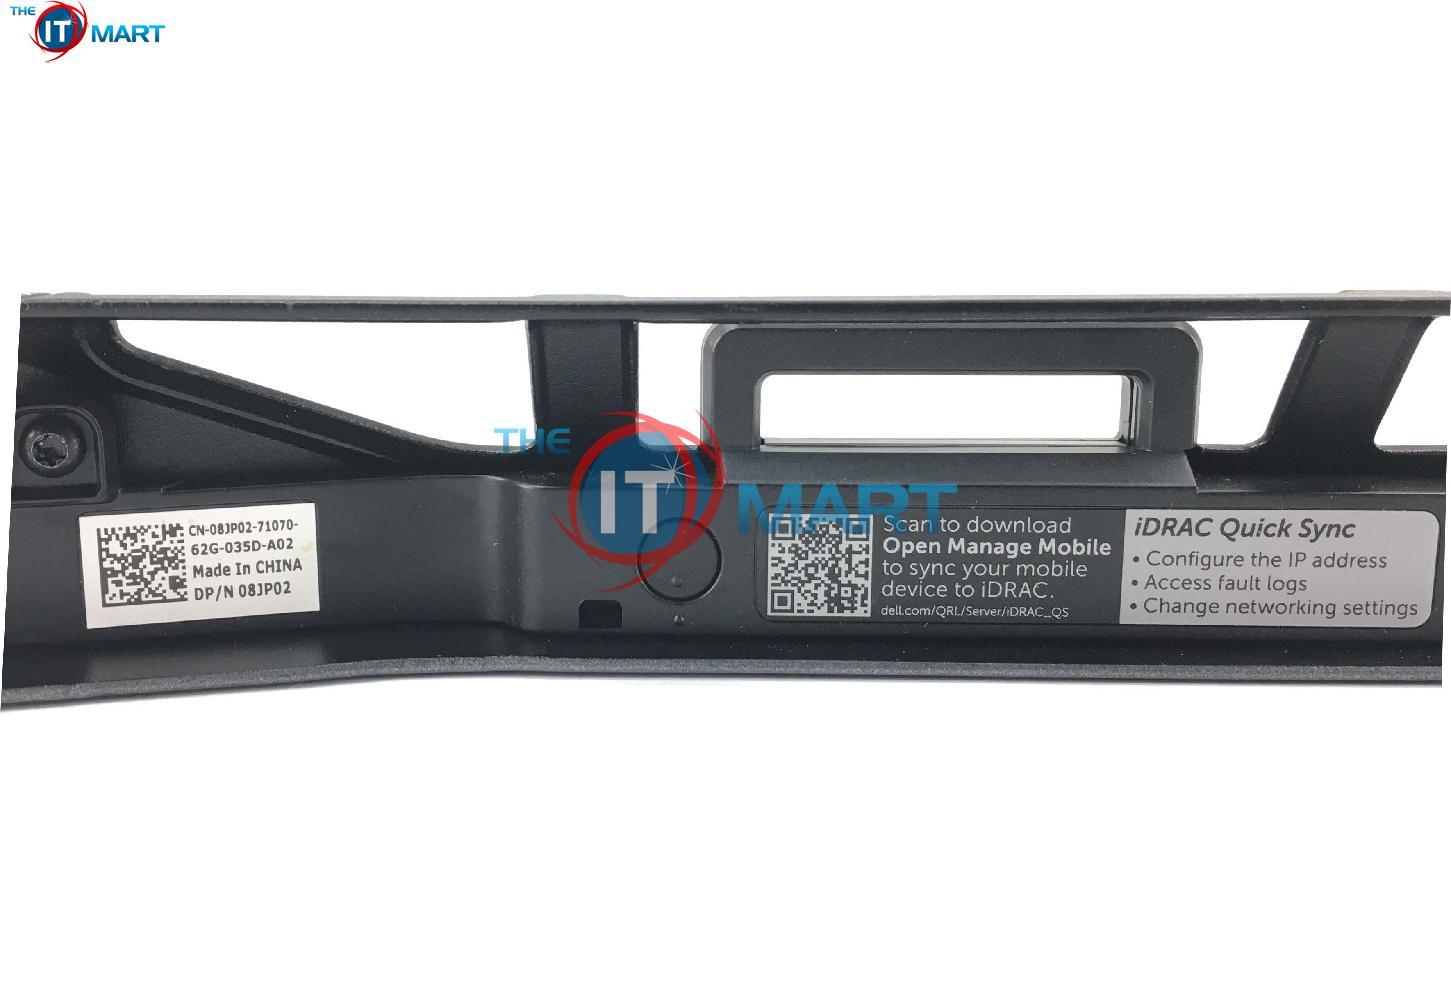 Dell PowerEdge R630 Sewcurity Bezel W/ iDRAC Quick Sync (8JP02)